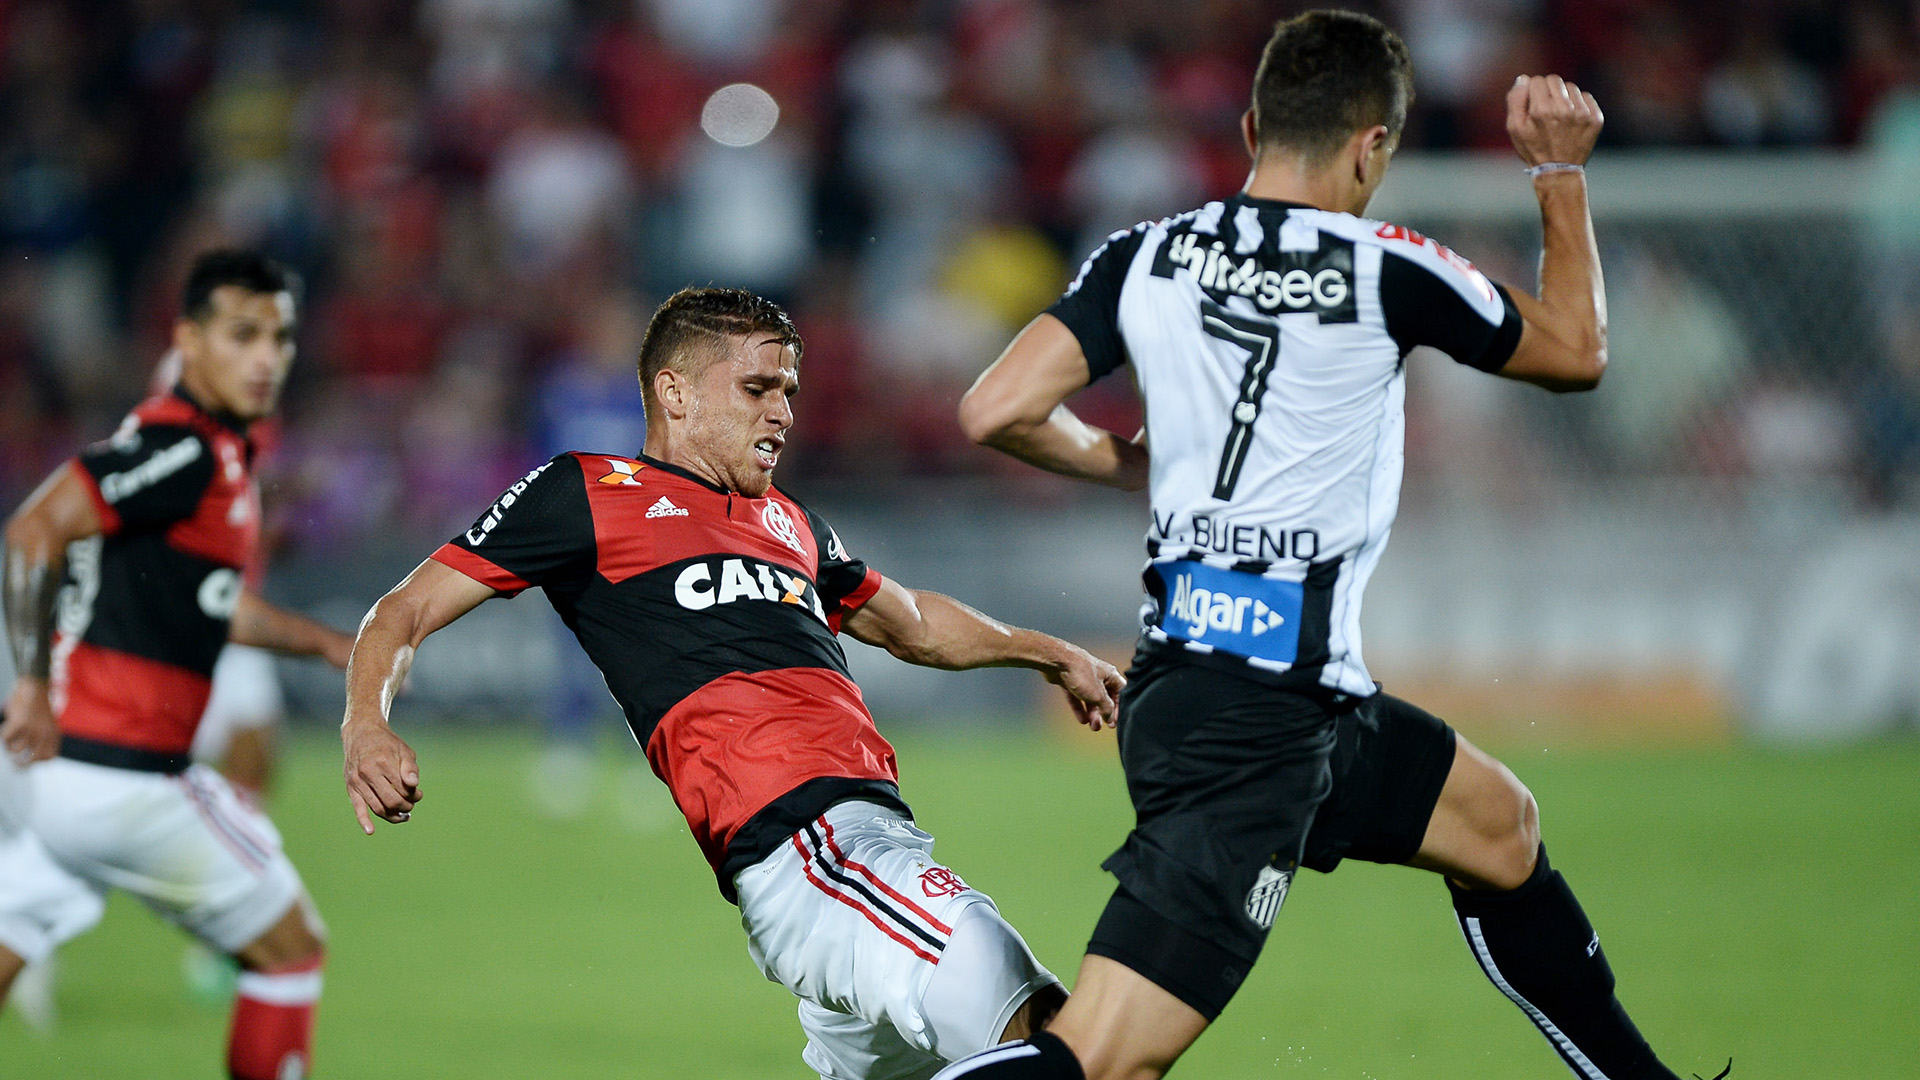 Gustavo Cuellar Vitor Bueno Flamengo Santos Copa do Brasil 28062017